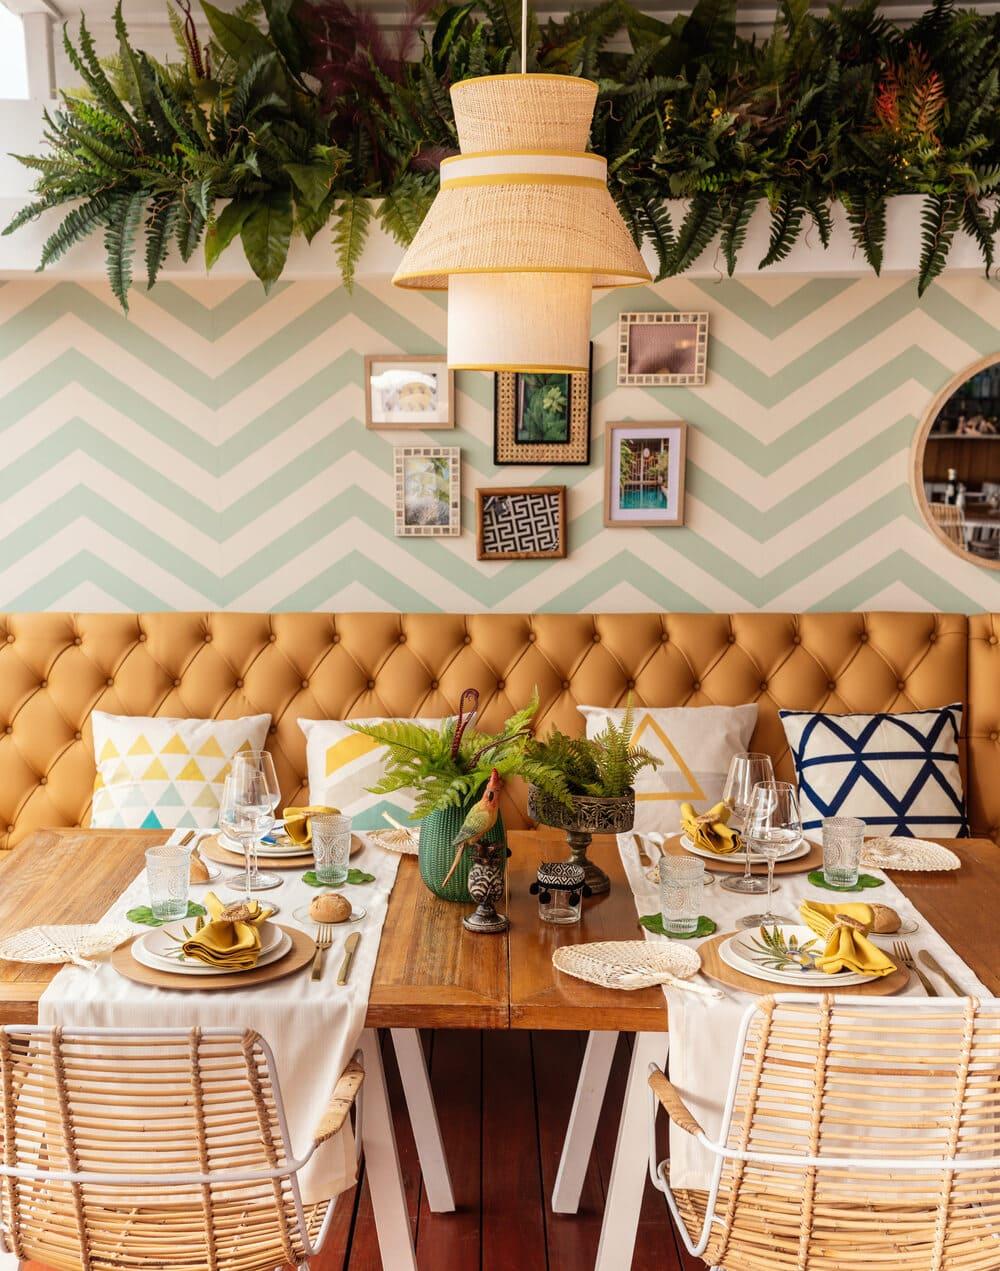 bb-restaurant-costa-adeje-tenerife (8)